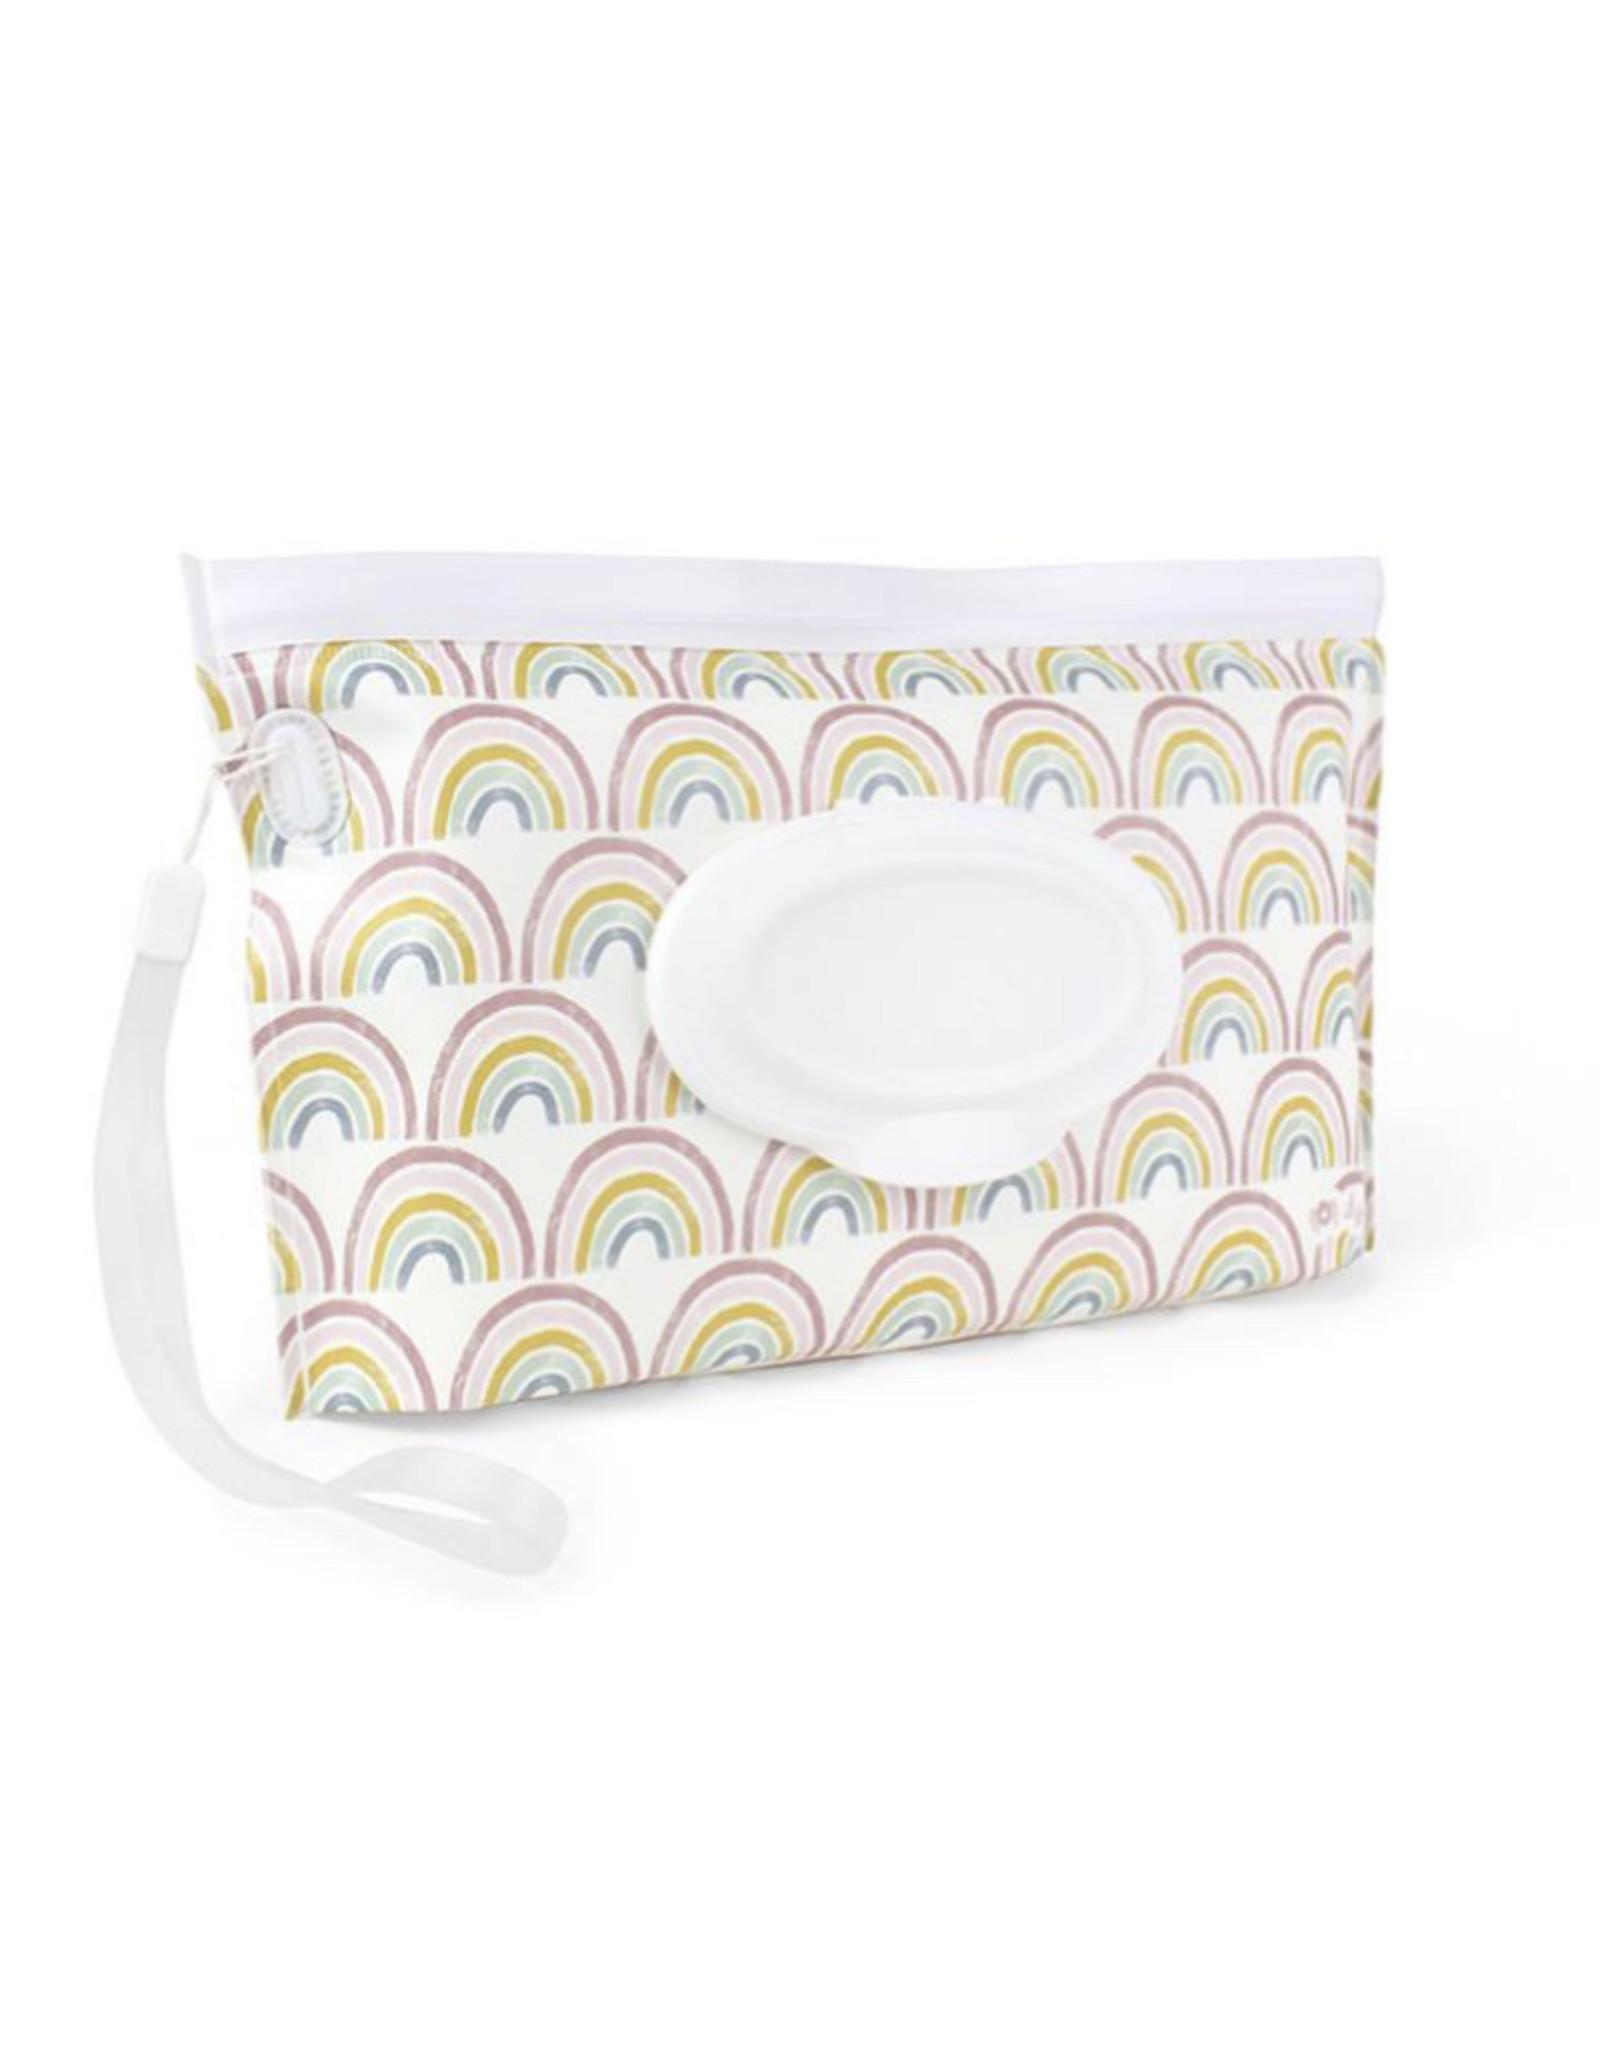 Itzy Ritzy Itzy Ritzy Reusable Pouch Wipes Case Rainbow